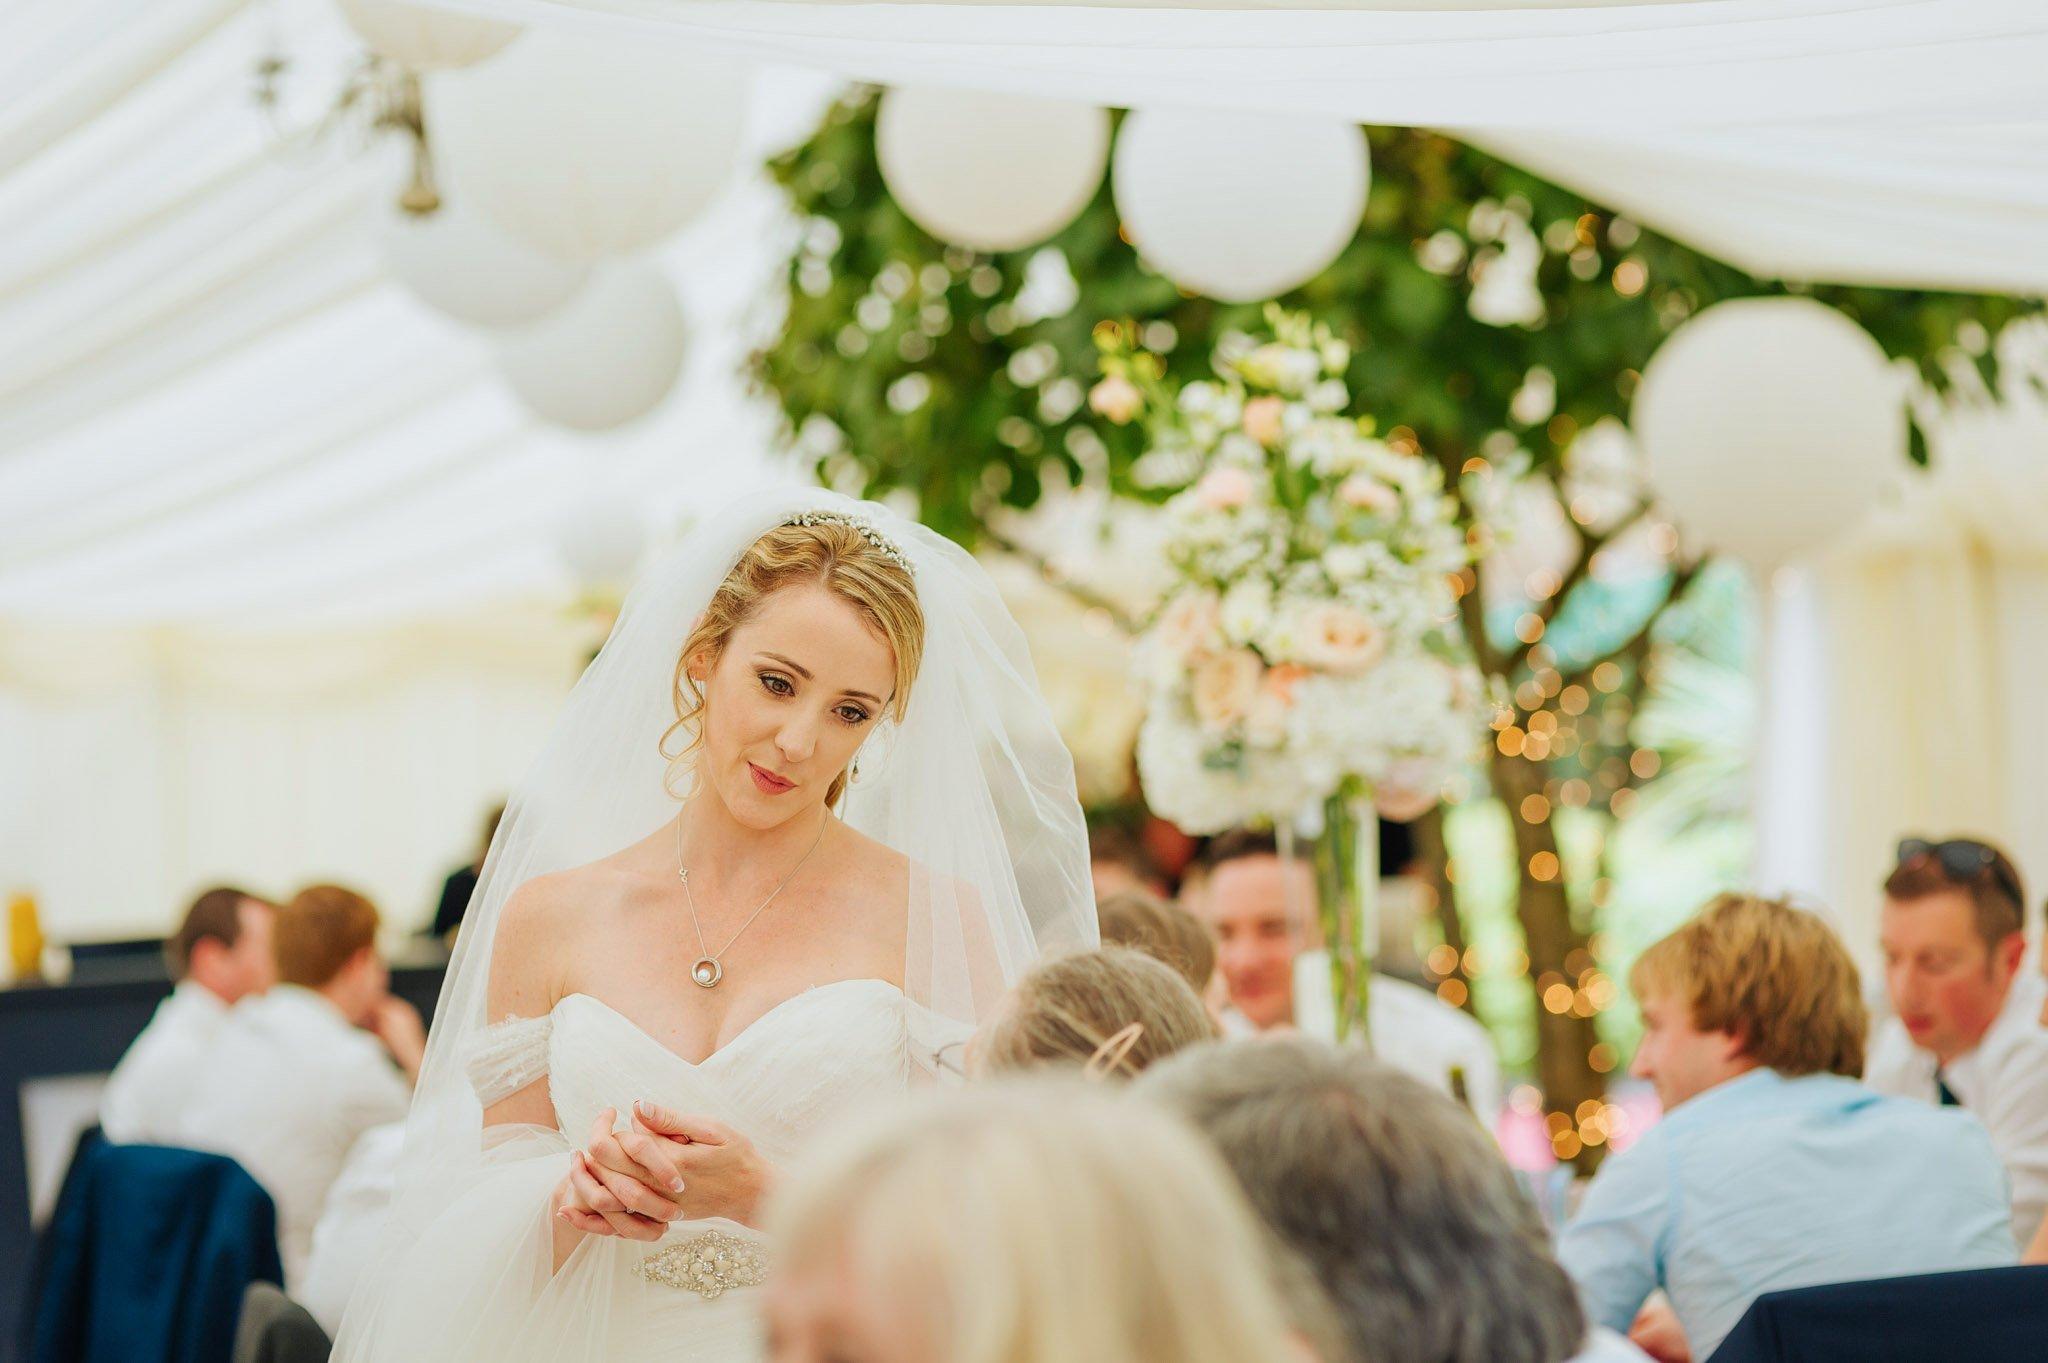 Georgina + Mike - Wedding photography in Malvern, Worcestershire 58